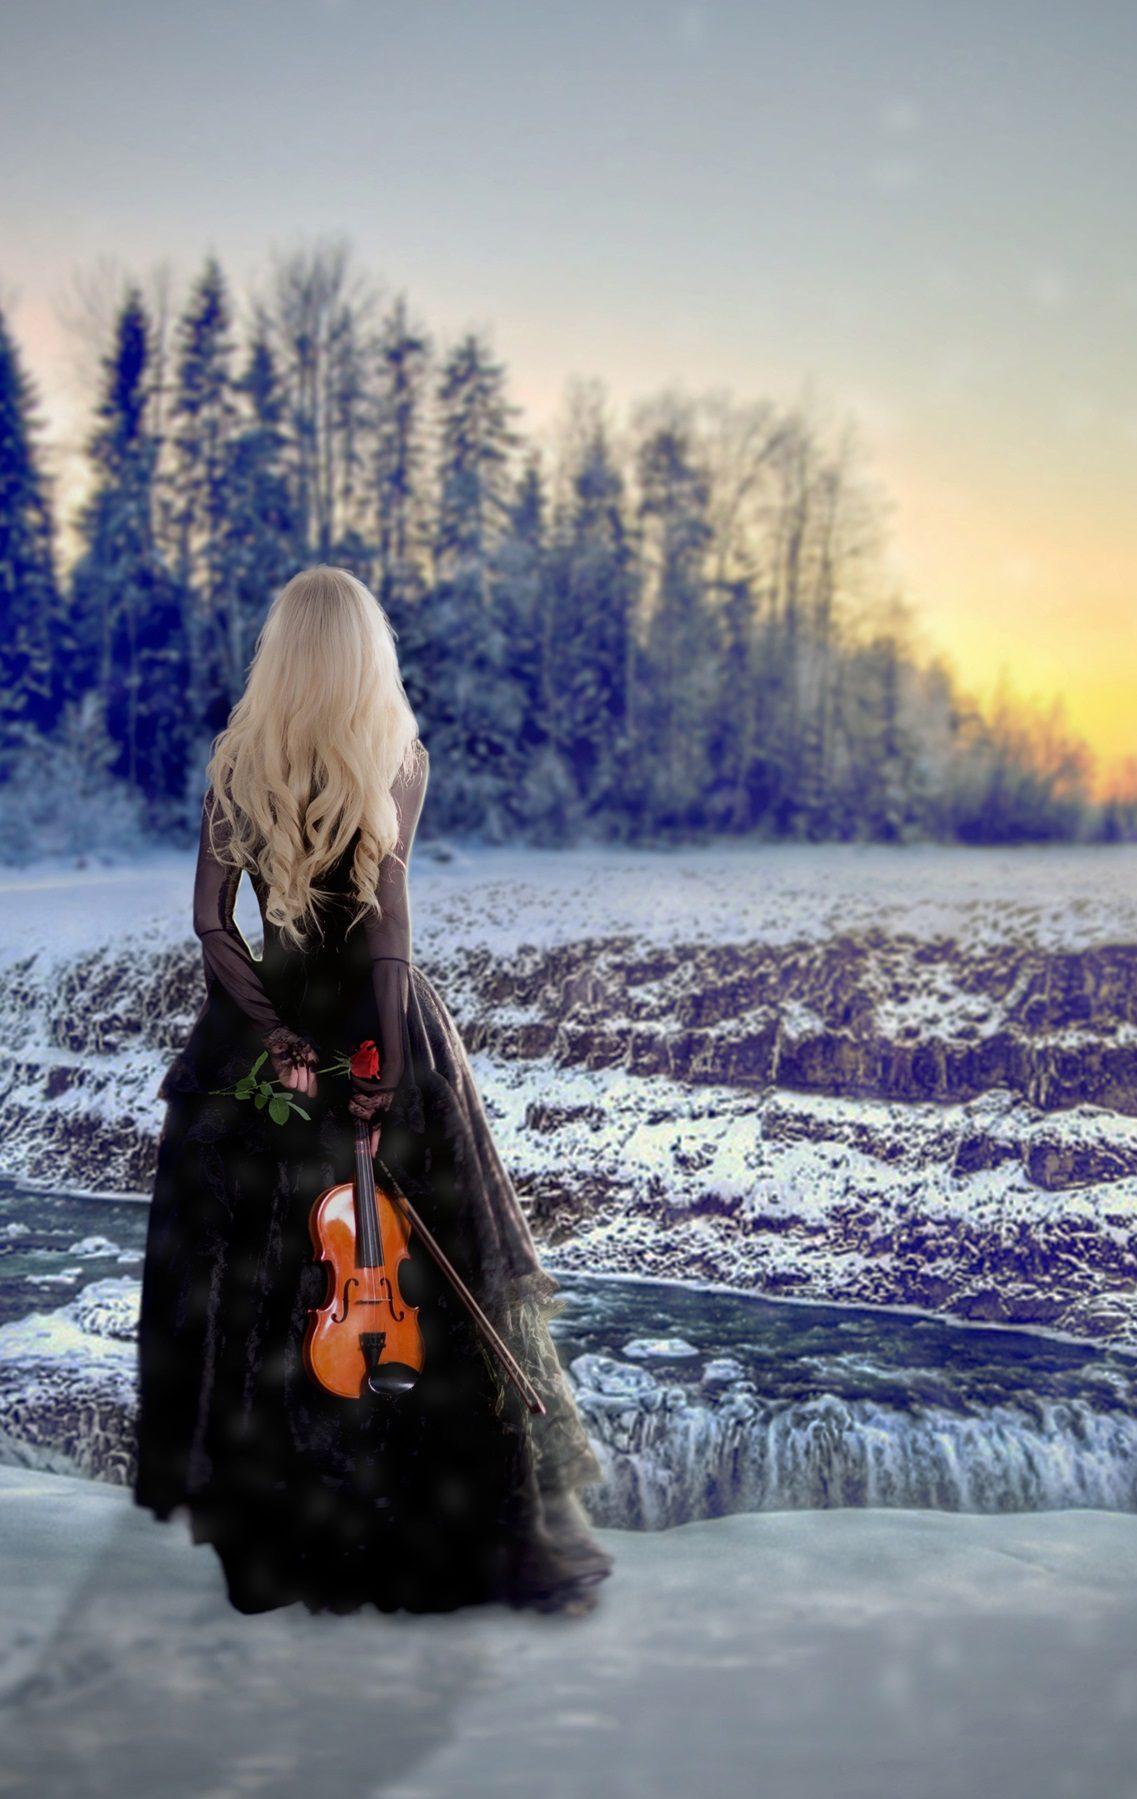 Blonde-girl-back-view-winter-snow-violin_2880x1800